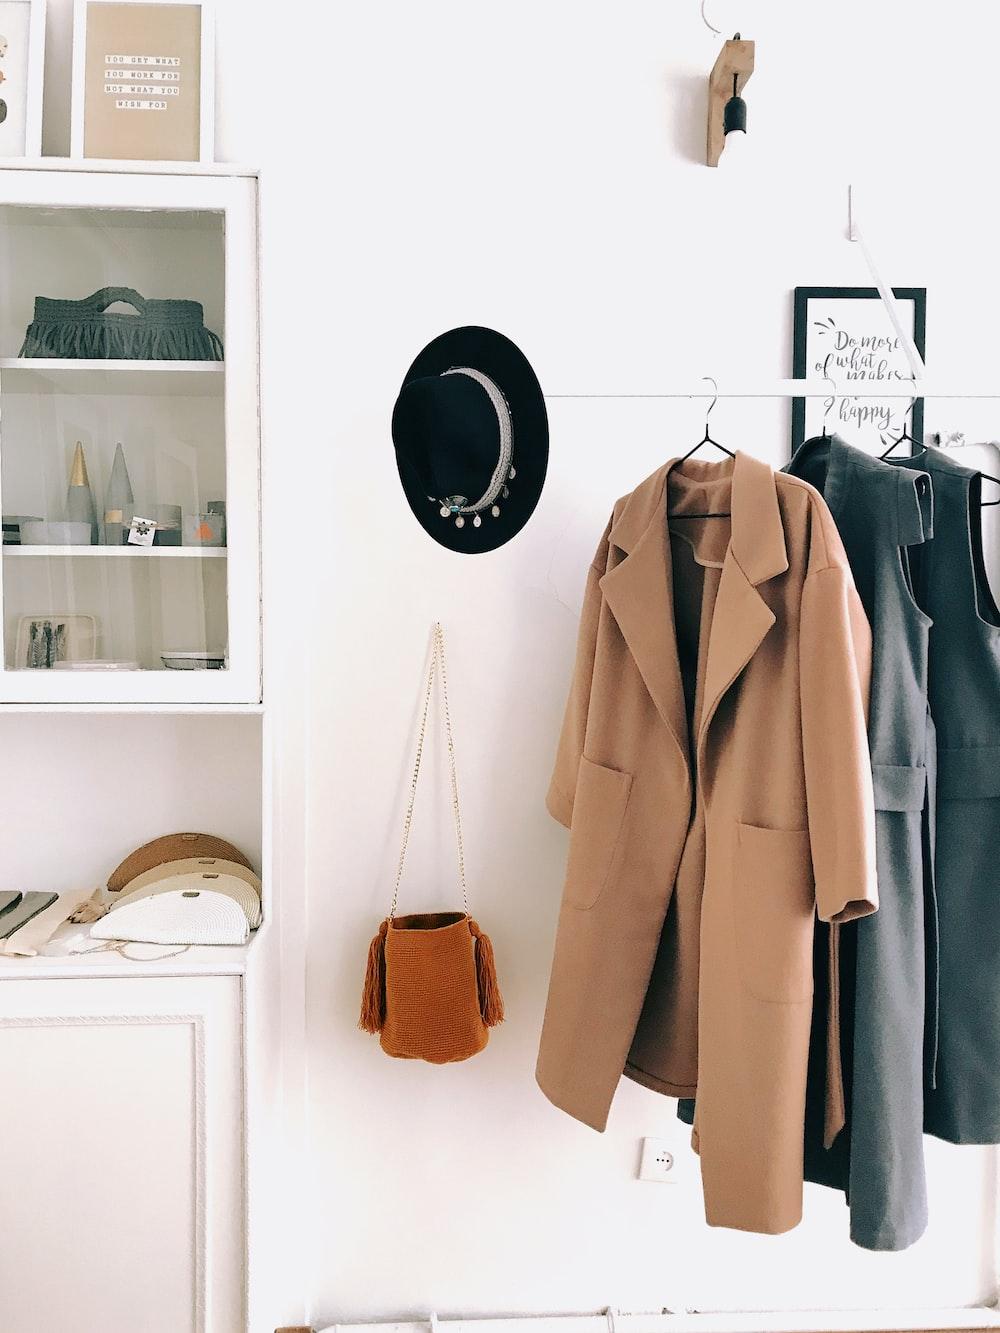 brown coat hanging beside the crossbody bag